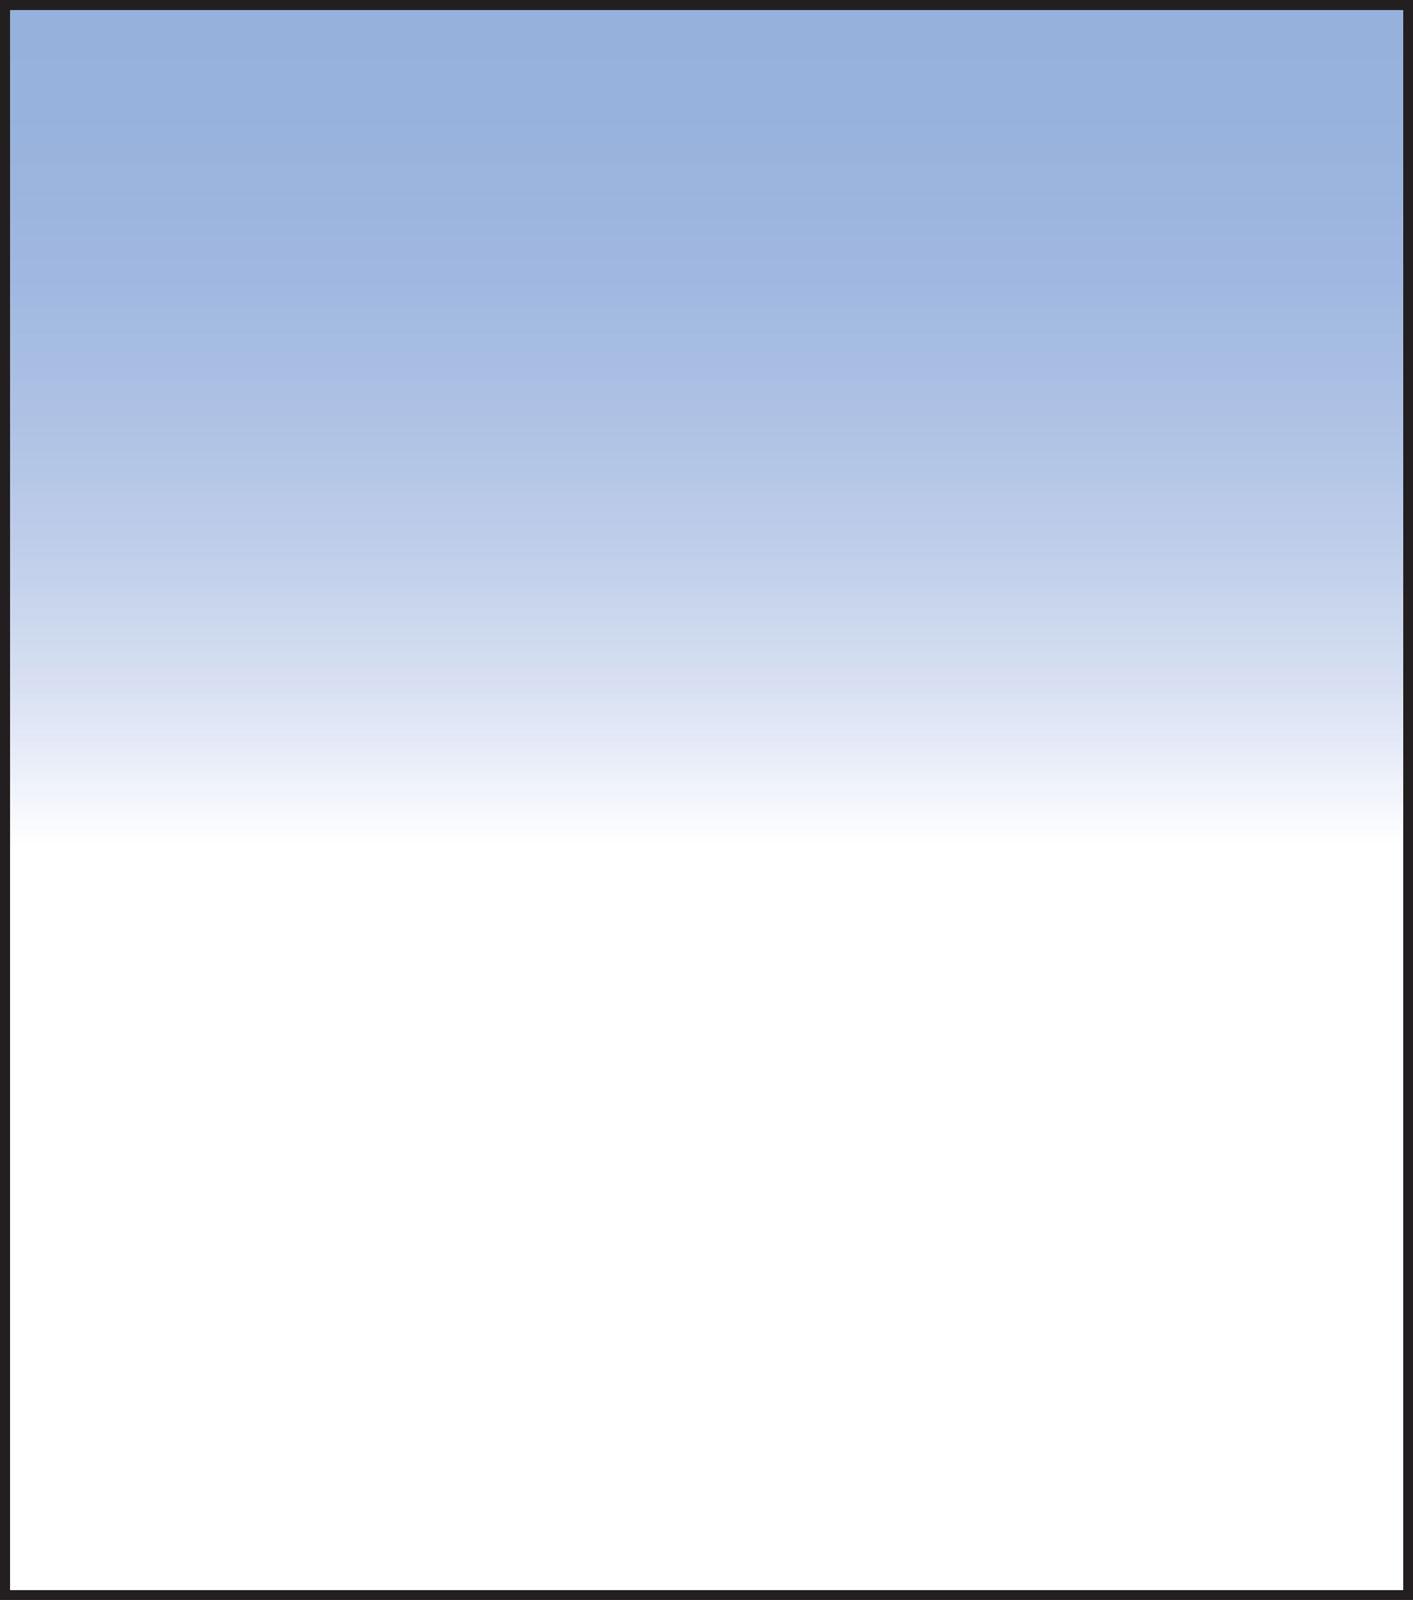 SW150-Sky-Blue-2-Hard-Grad